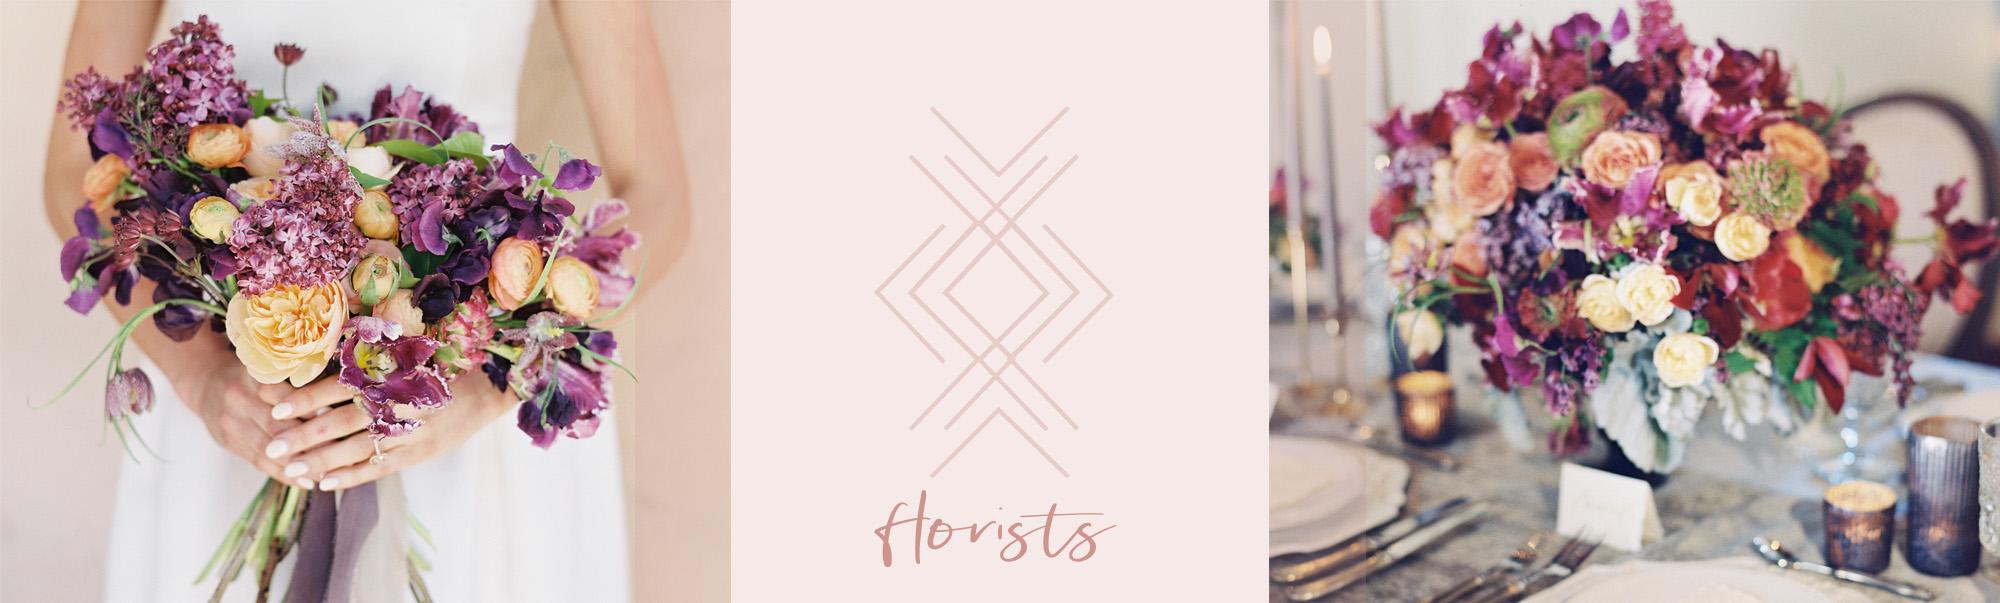 firstcomes_preferred_vendors_FLORISTS.jpg